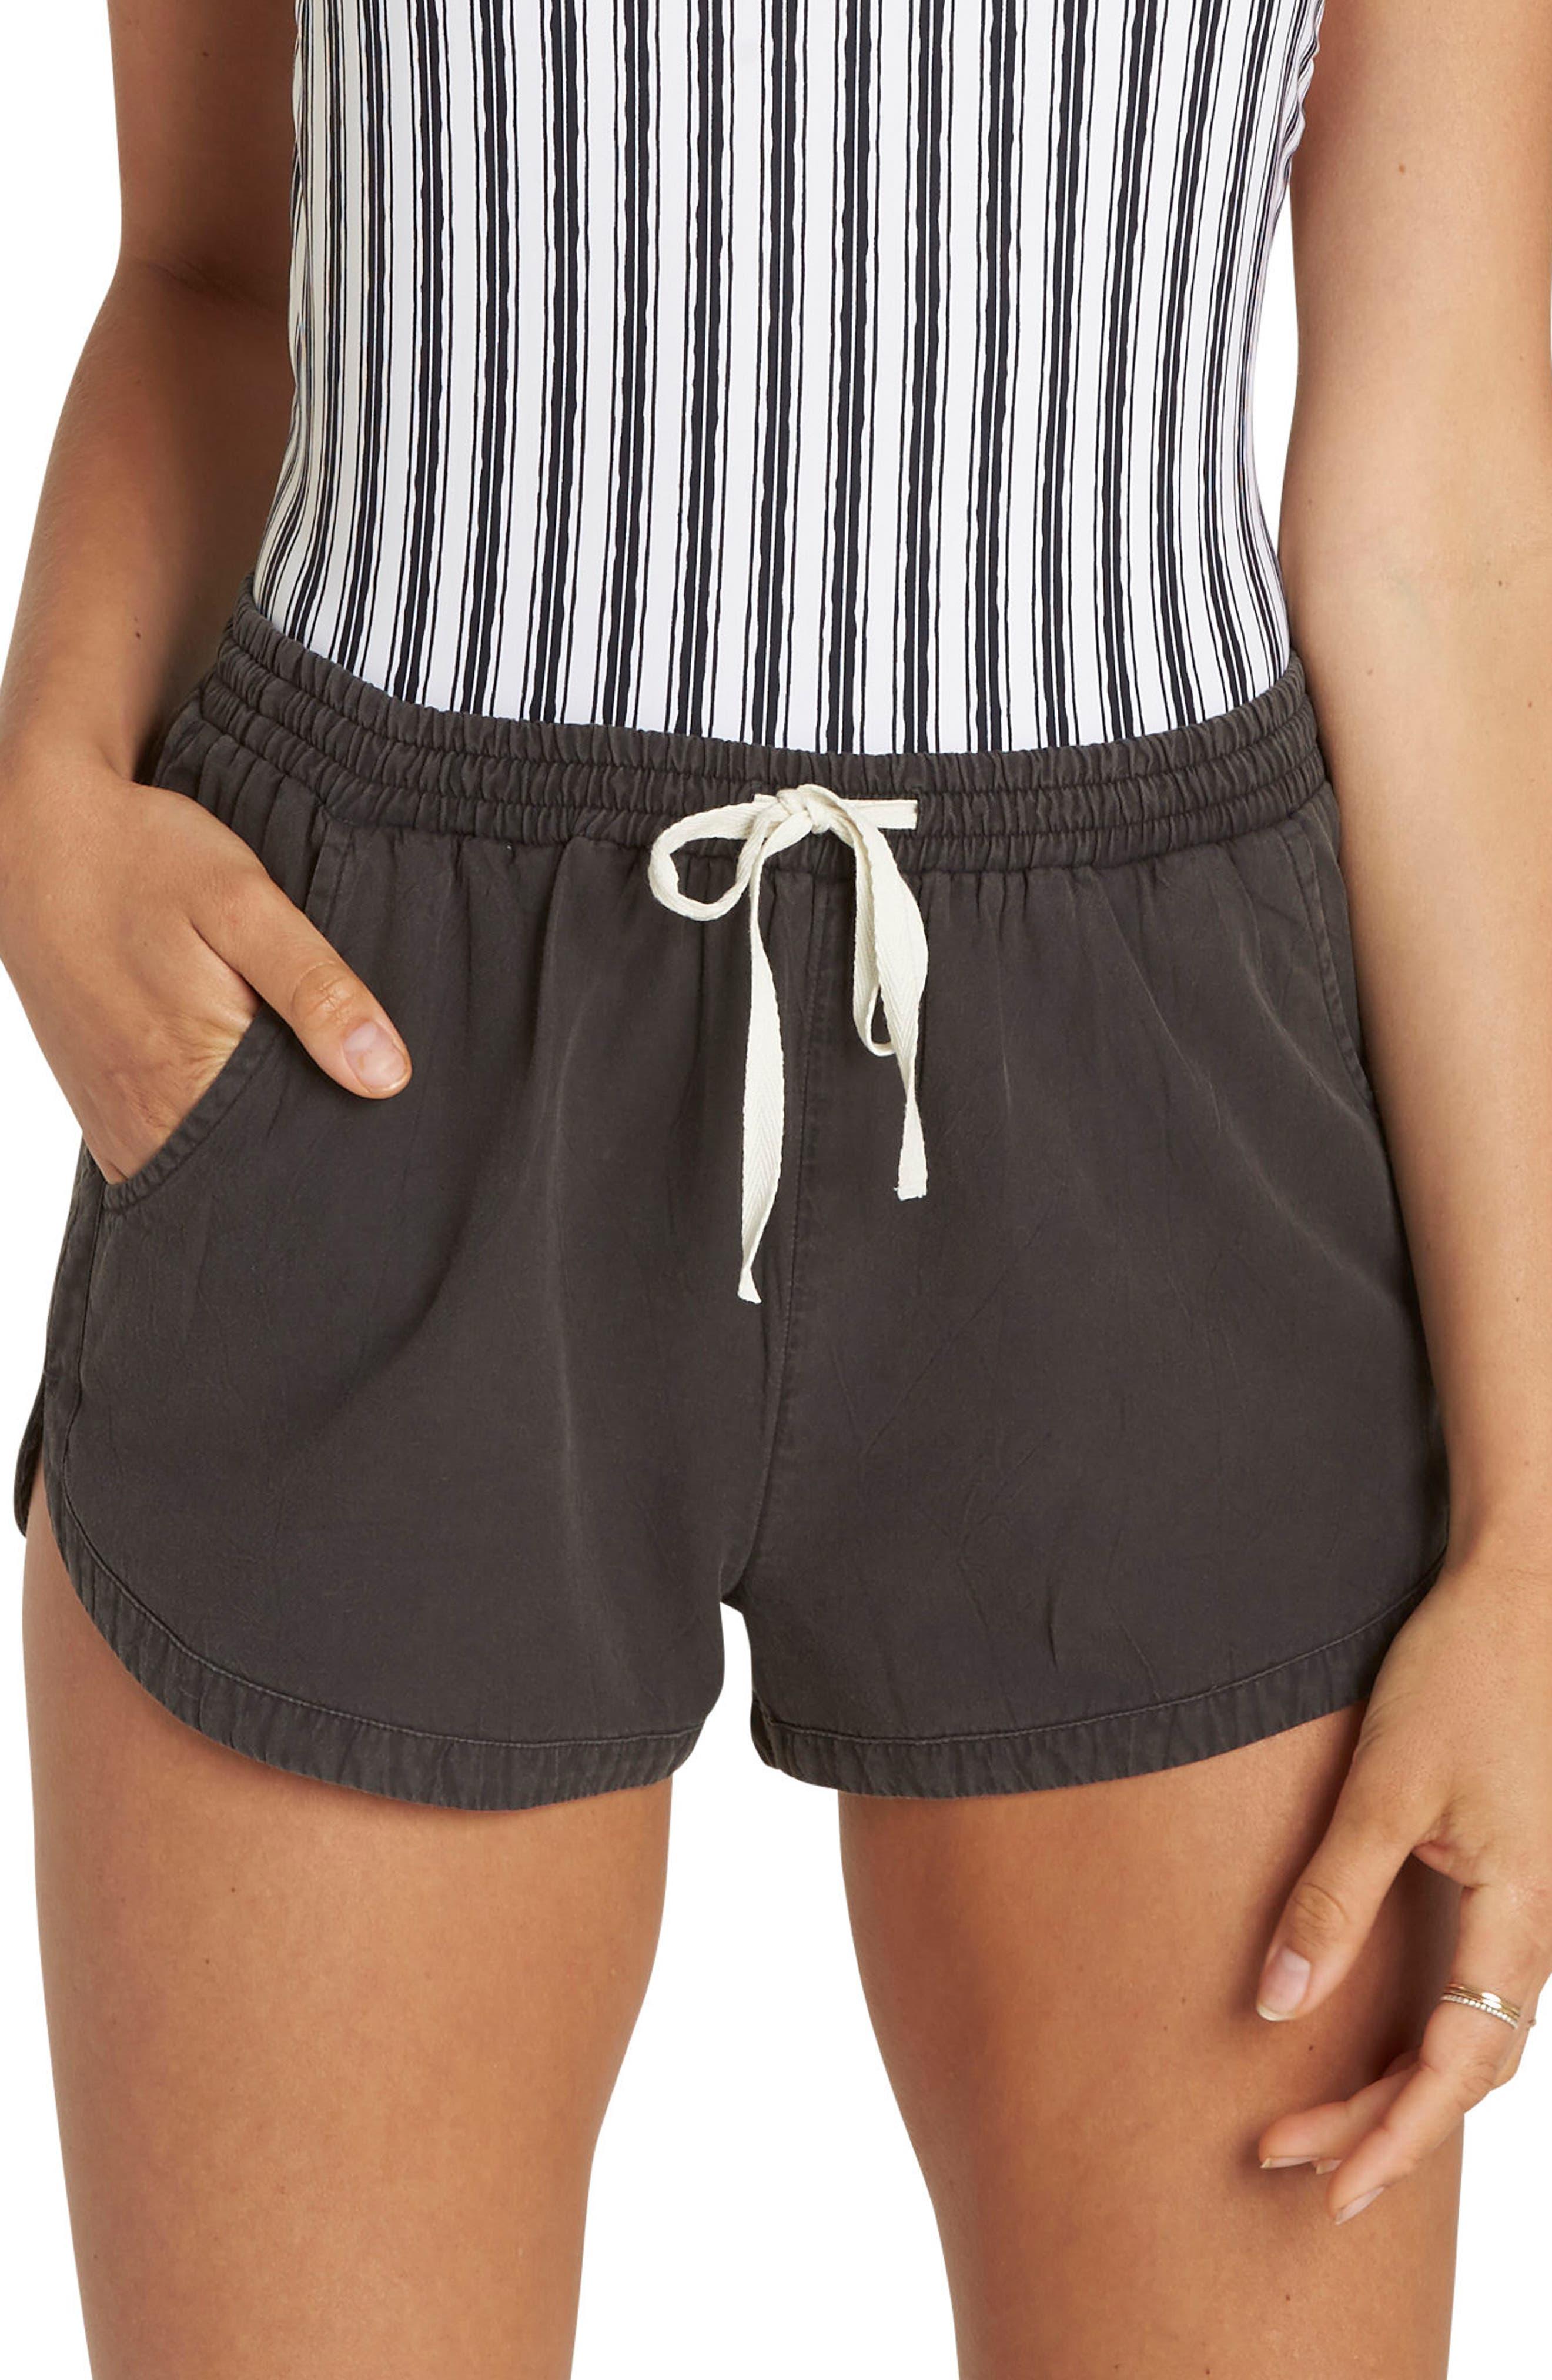 Women's Billabong 'Road Trippin' Shorts,  Small - Black